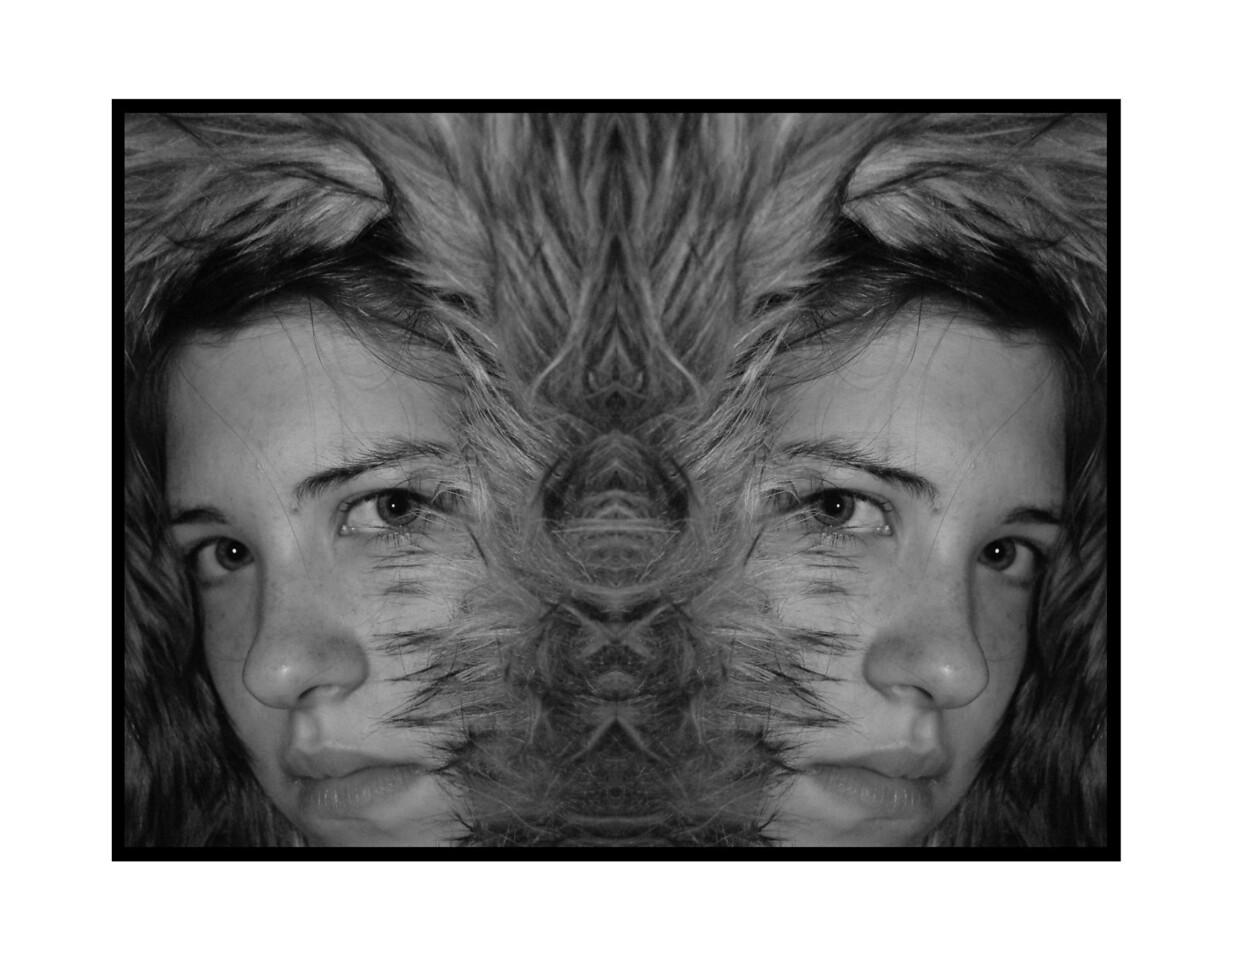 Rachel - Mirror faces